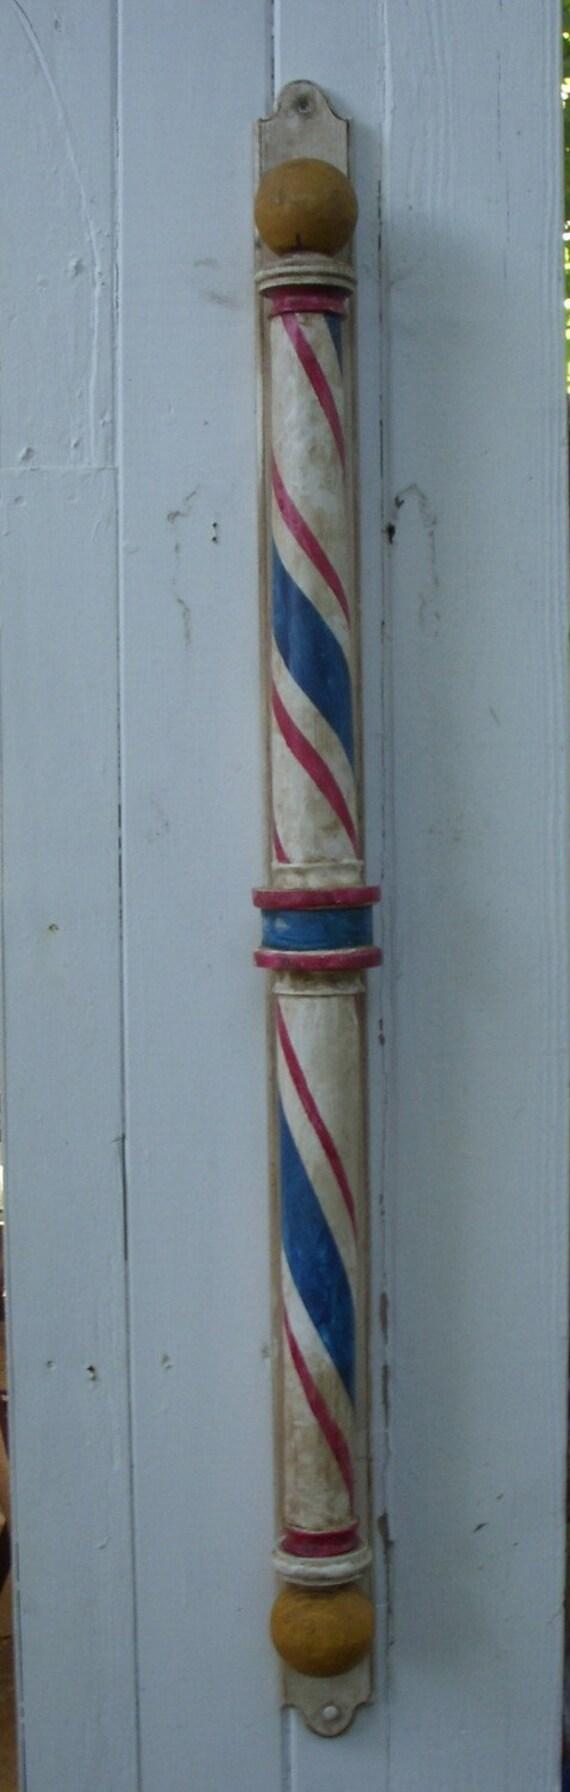 Handmade - Wood Barber Pole - Handcrafted - Circa Replica 1890 Barber Shop Pole - Wooden - dentist, doctor, surgeon, gift idea